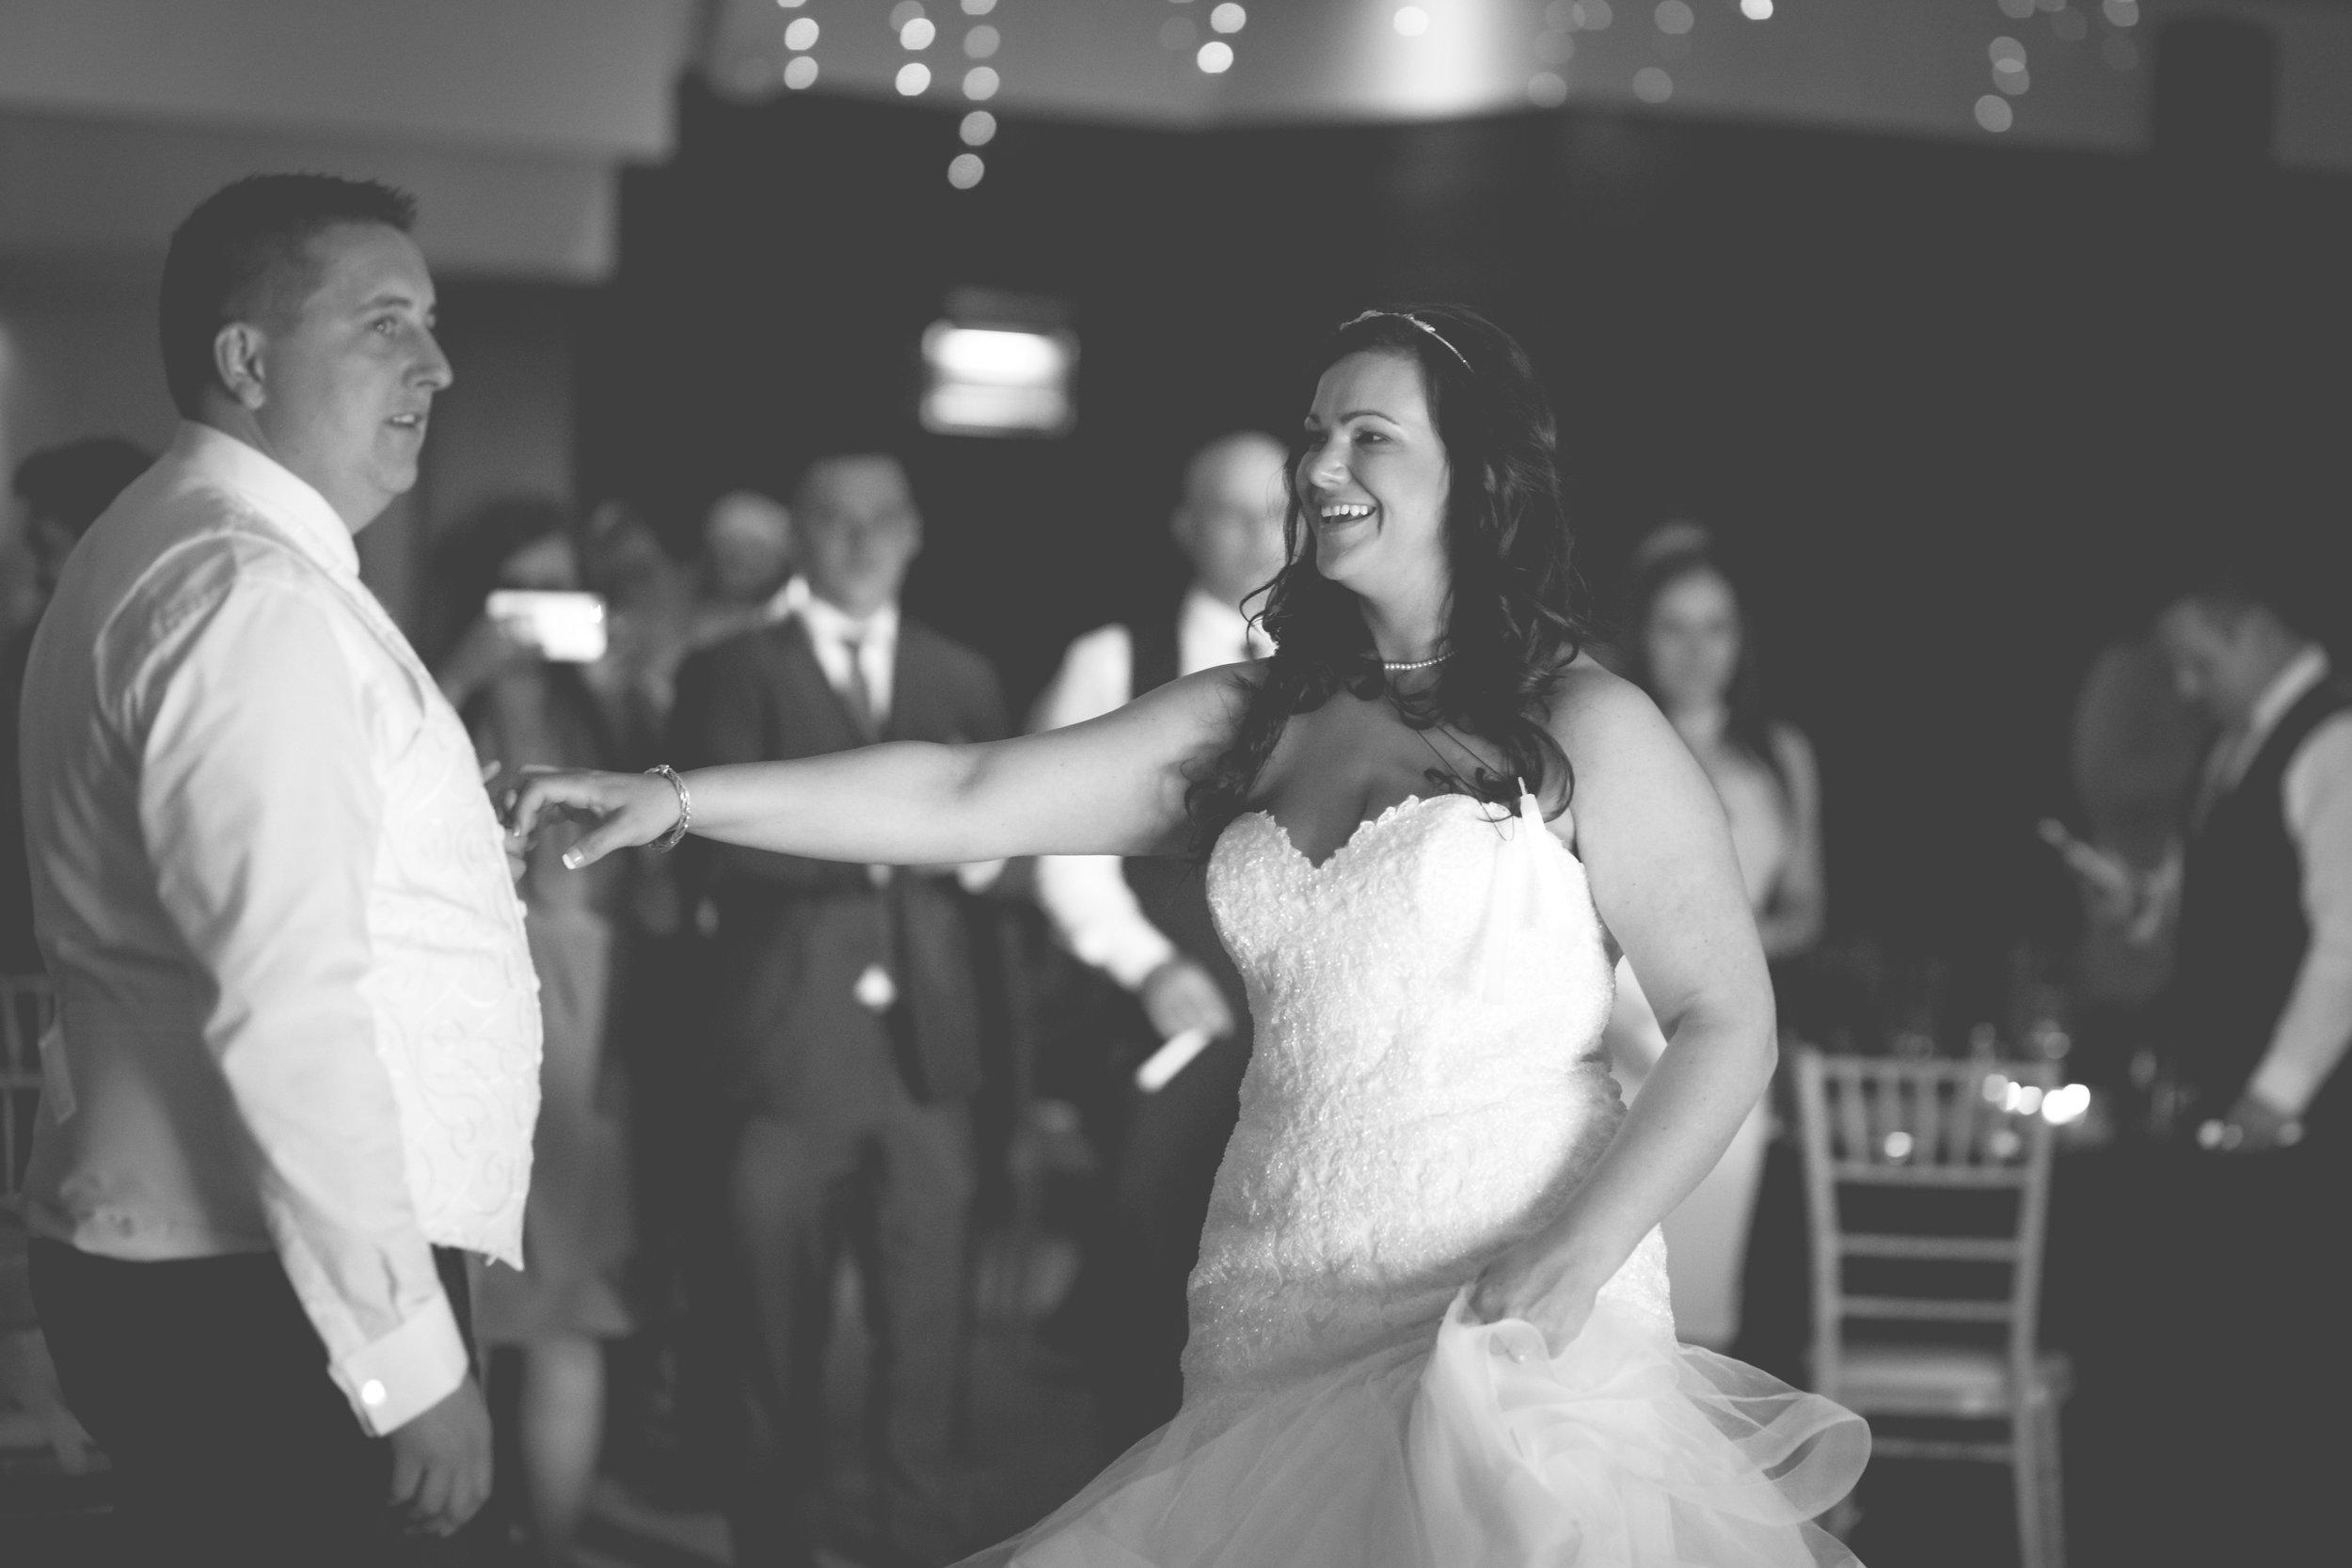 Helena & Terence - First Dance-21.jpg